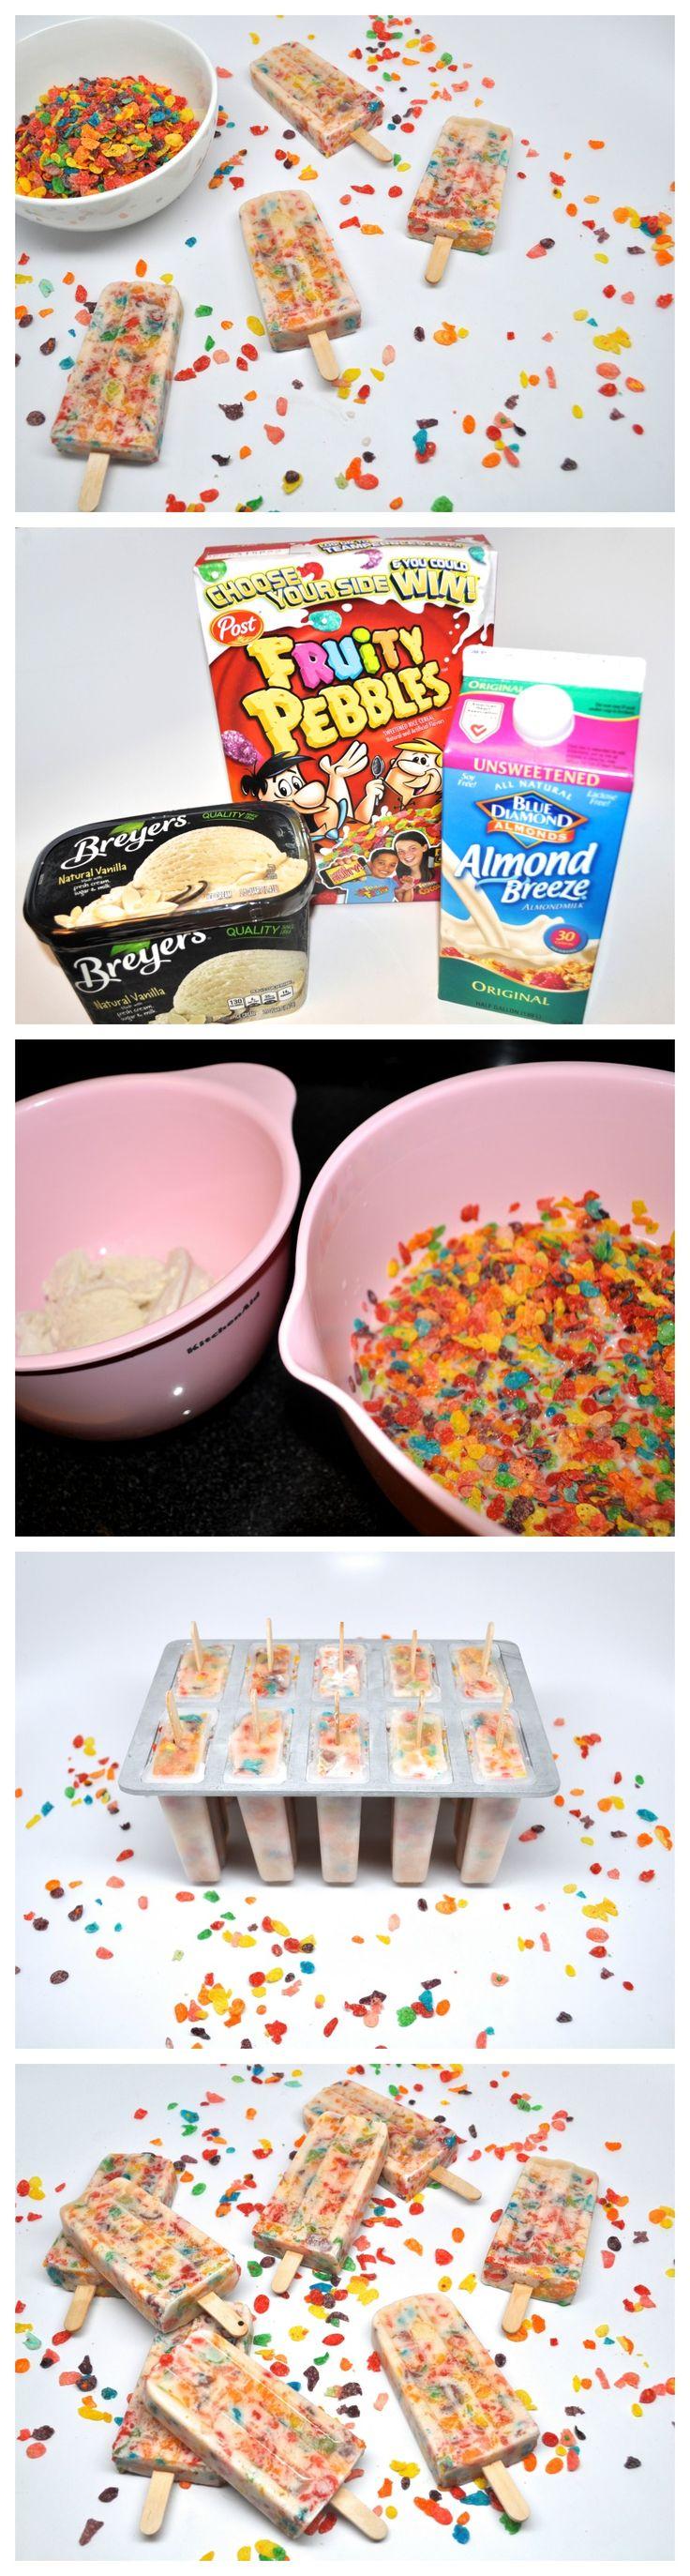 Cereal & Milk Breakfast Popsicles : Stoney Clover Lane Birthday breakfast for my Summer babies.